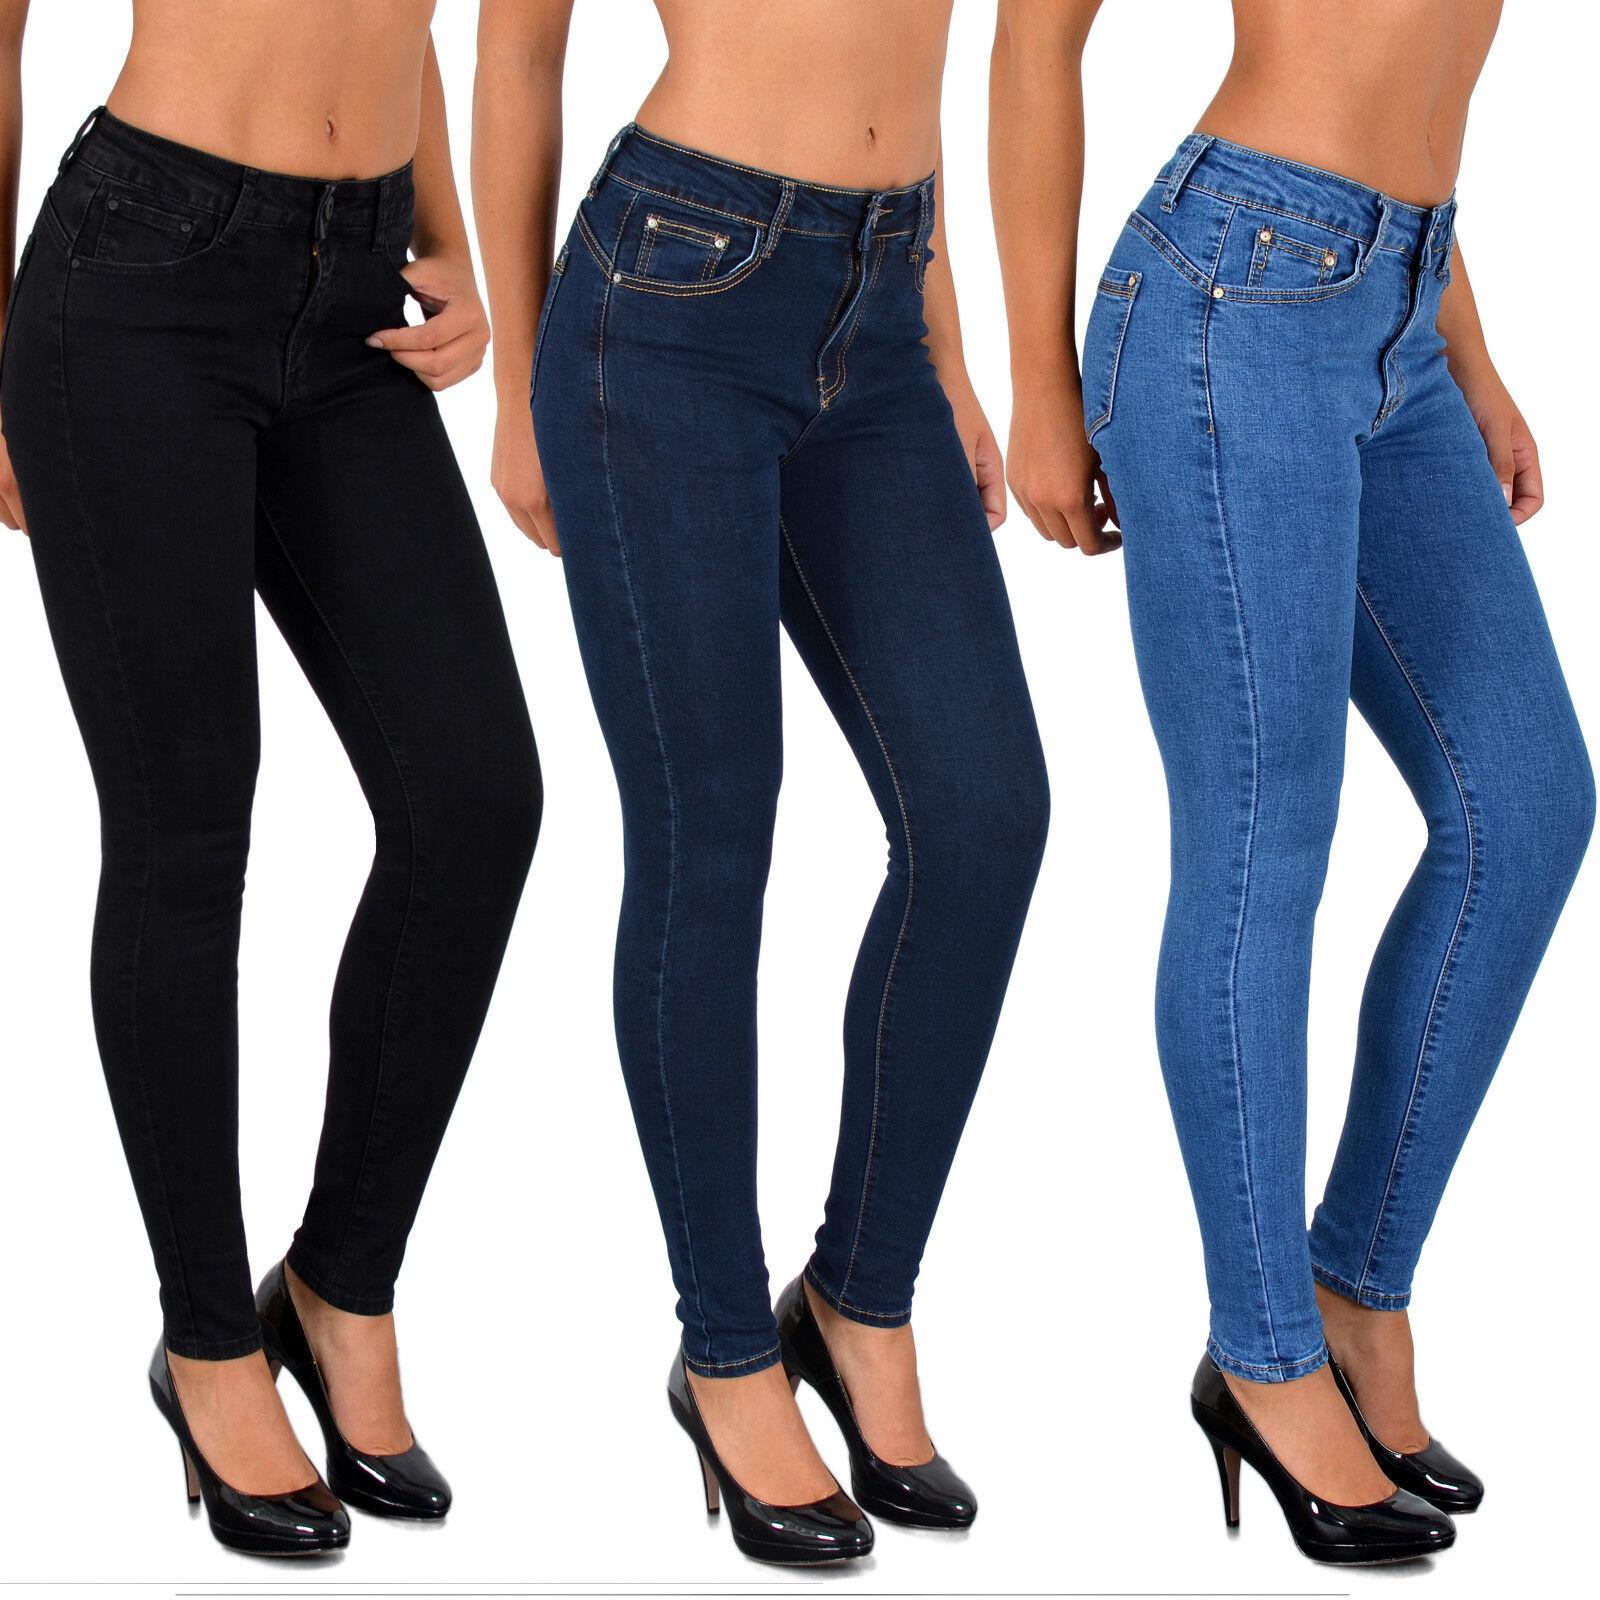 Damen Skinny Jeans Hose Push up Effekt Jeans Shape Jeans Hose - S900